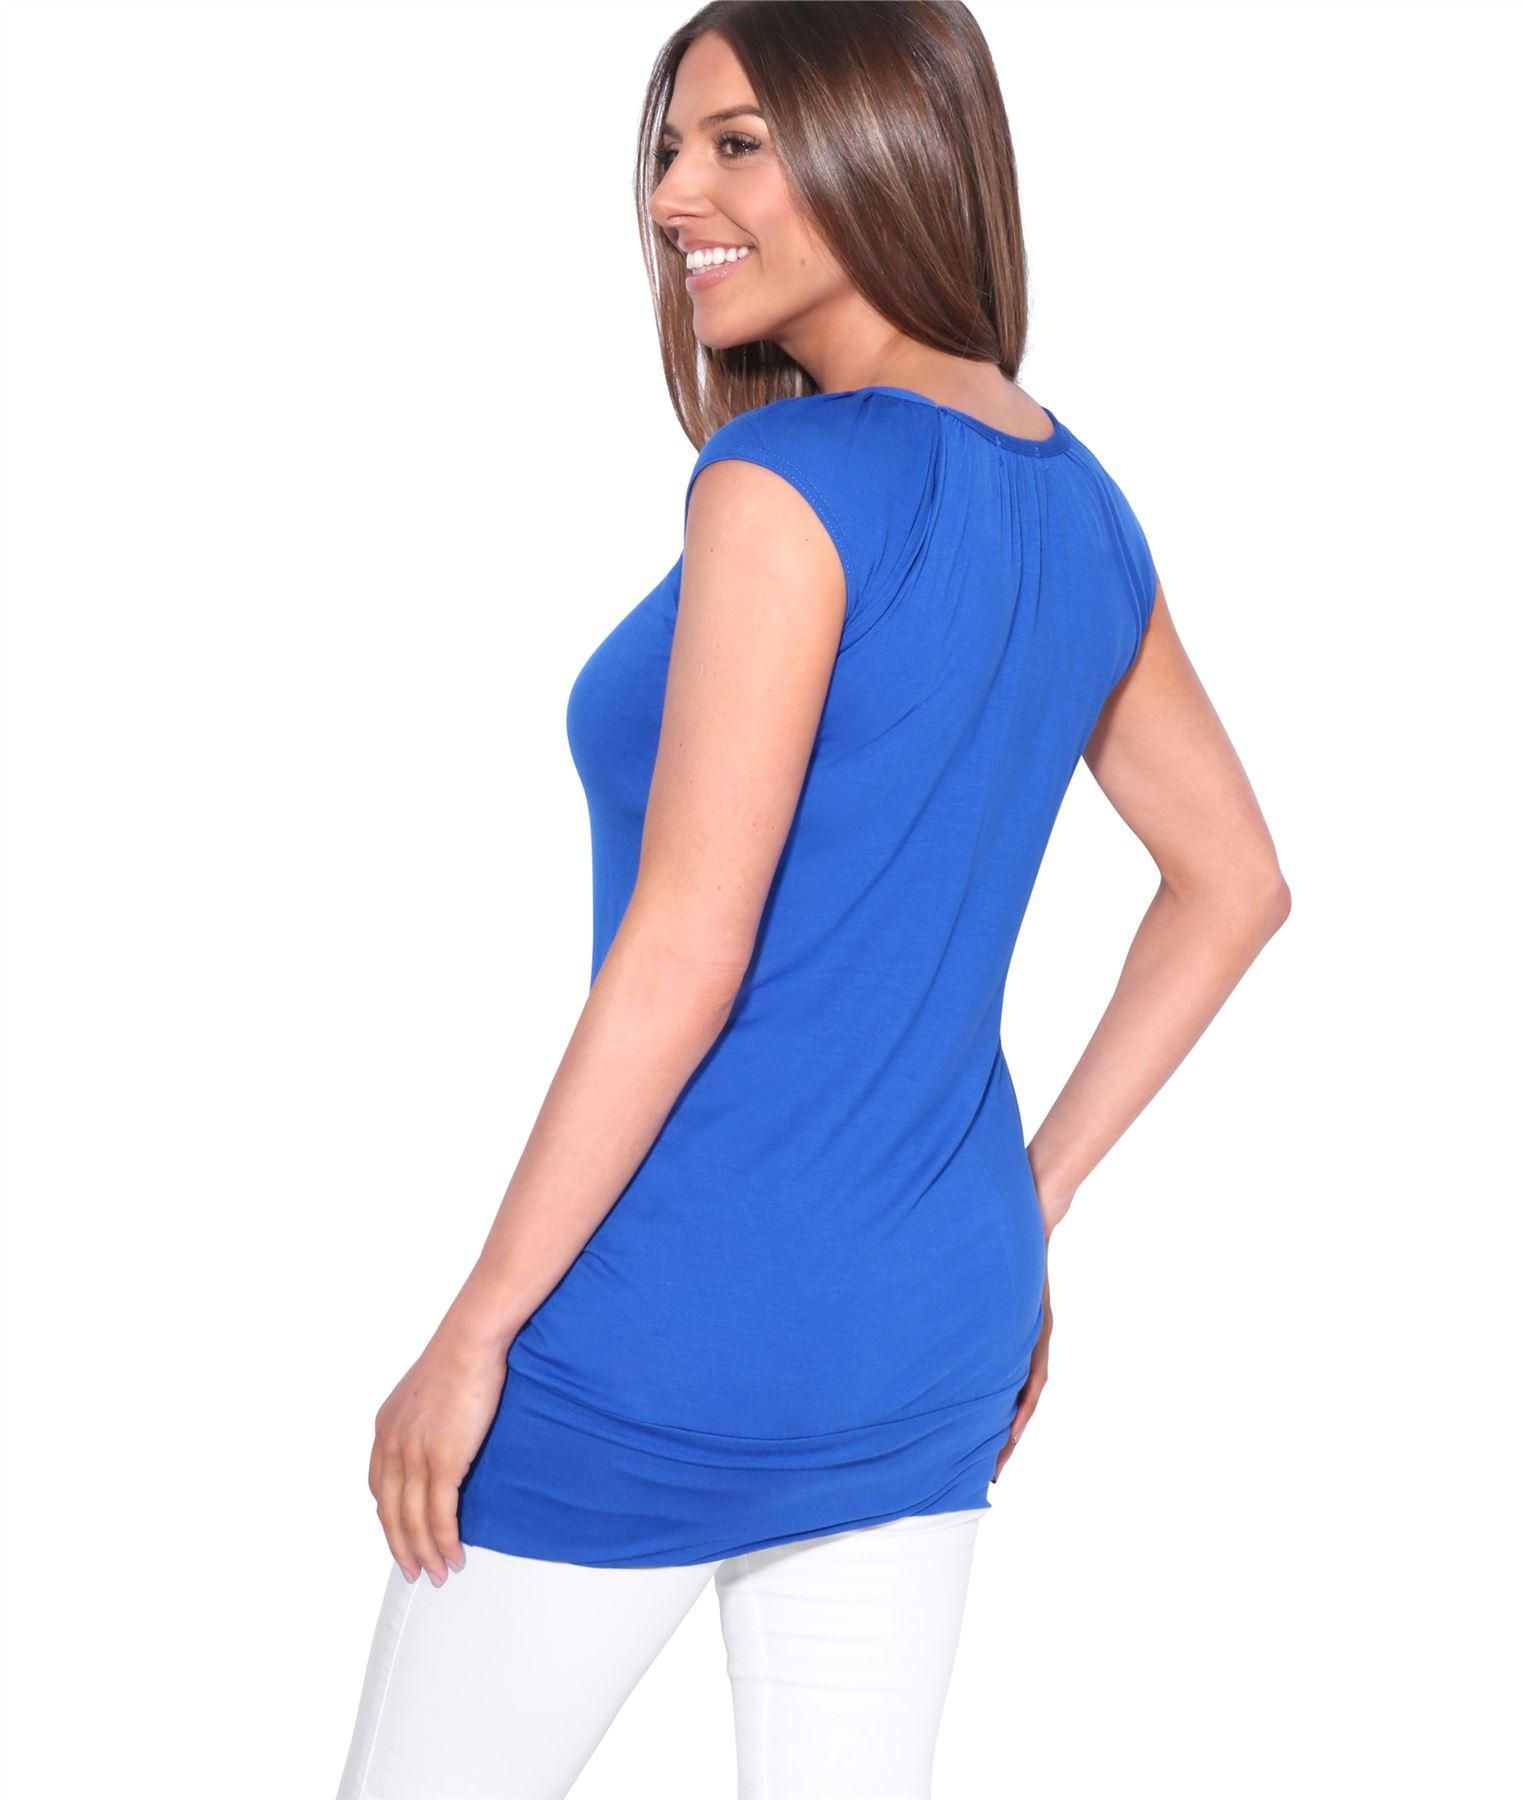 Womens-Ladies-Plain-T-Shirt-Short-Sleeve-Long-Loose-V-Neck-Blouse-Tunic-Top thumbnail 51